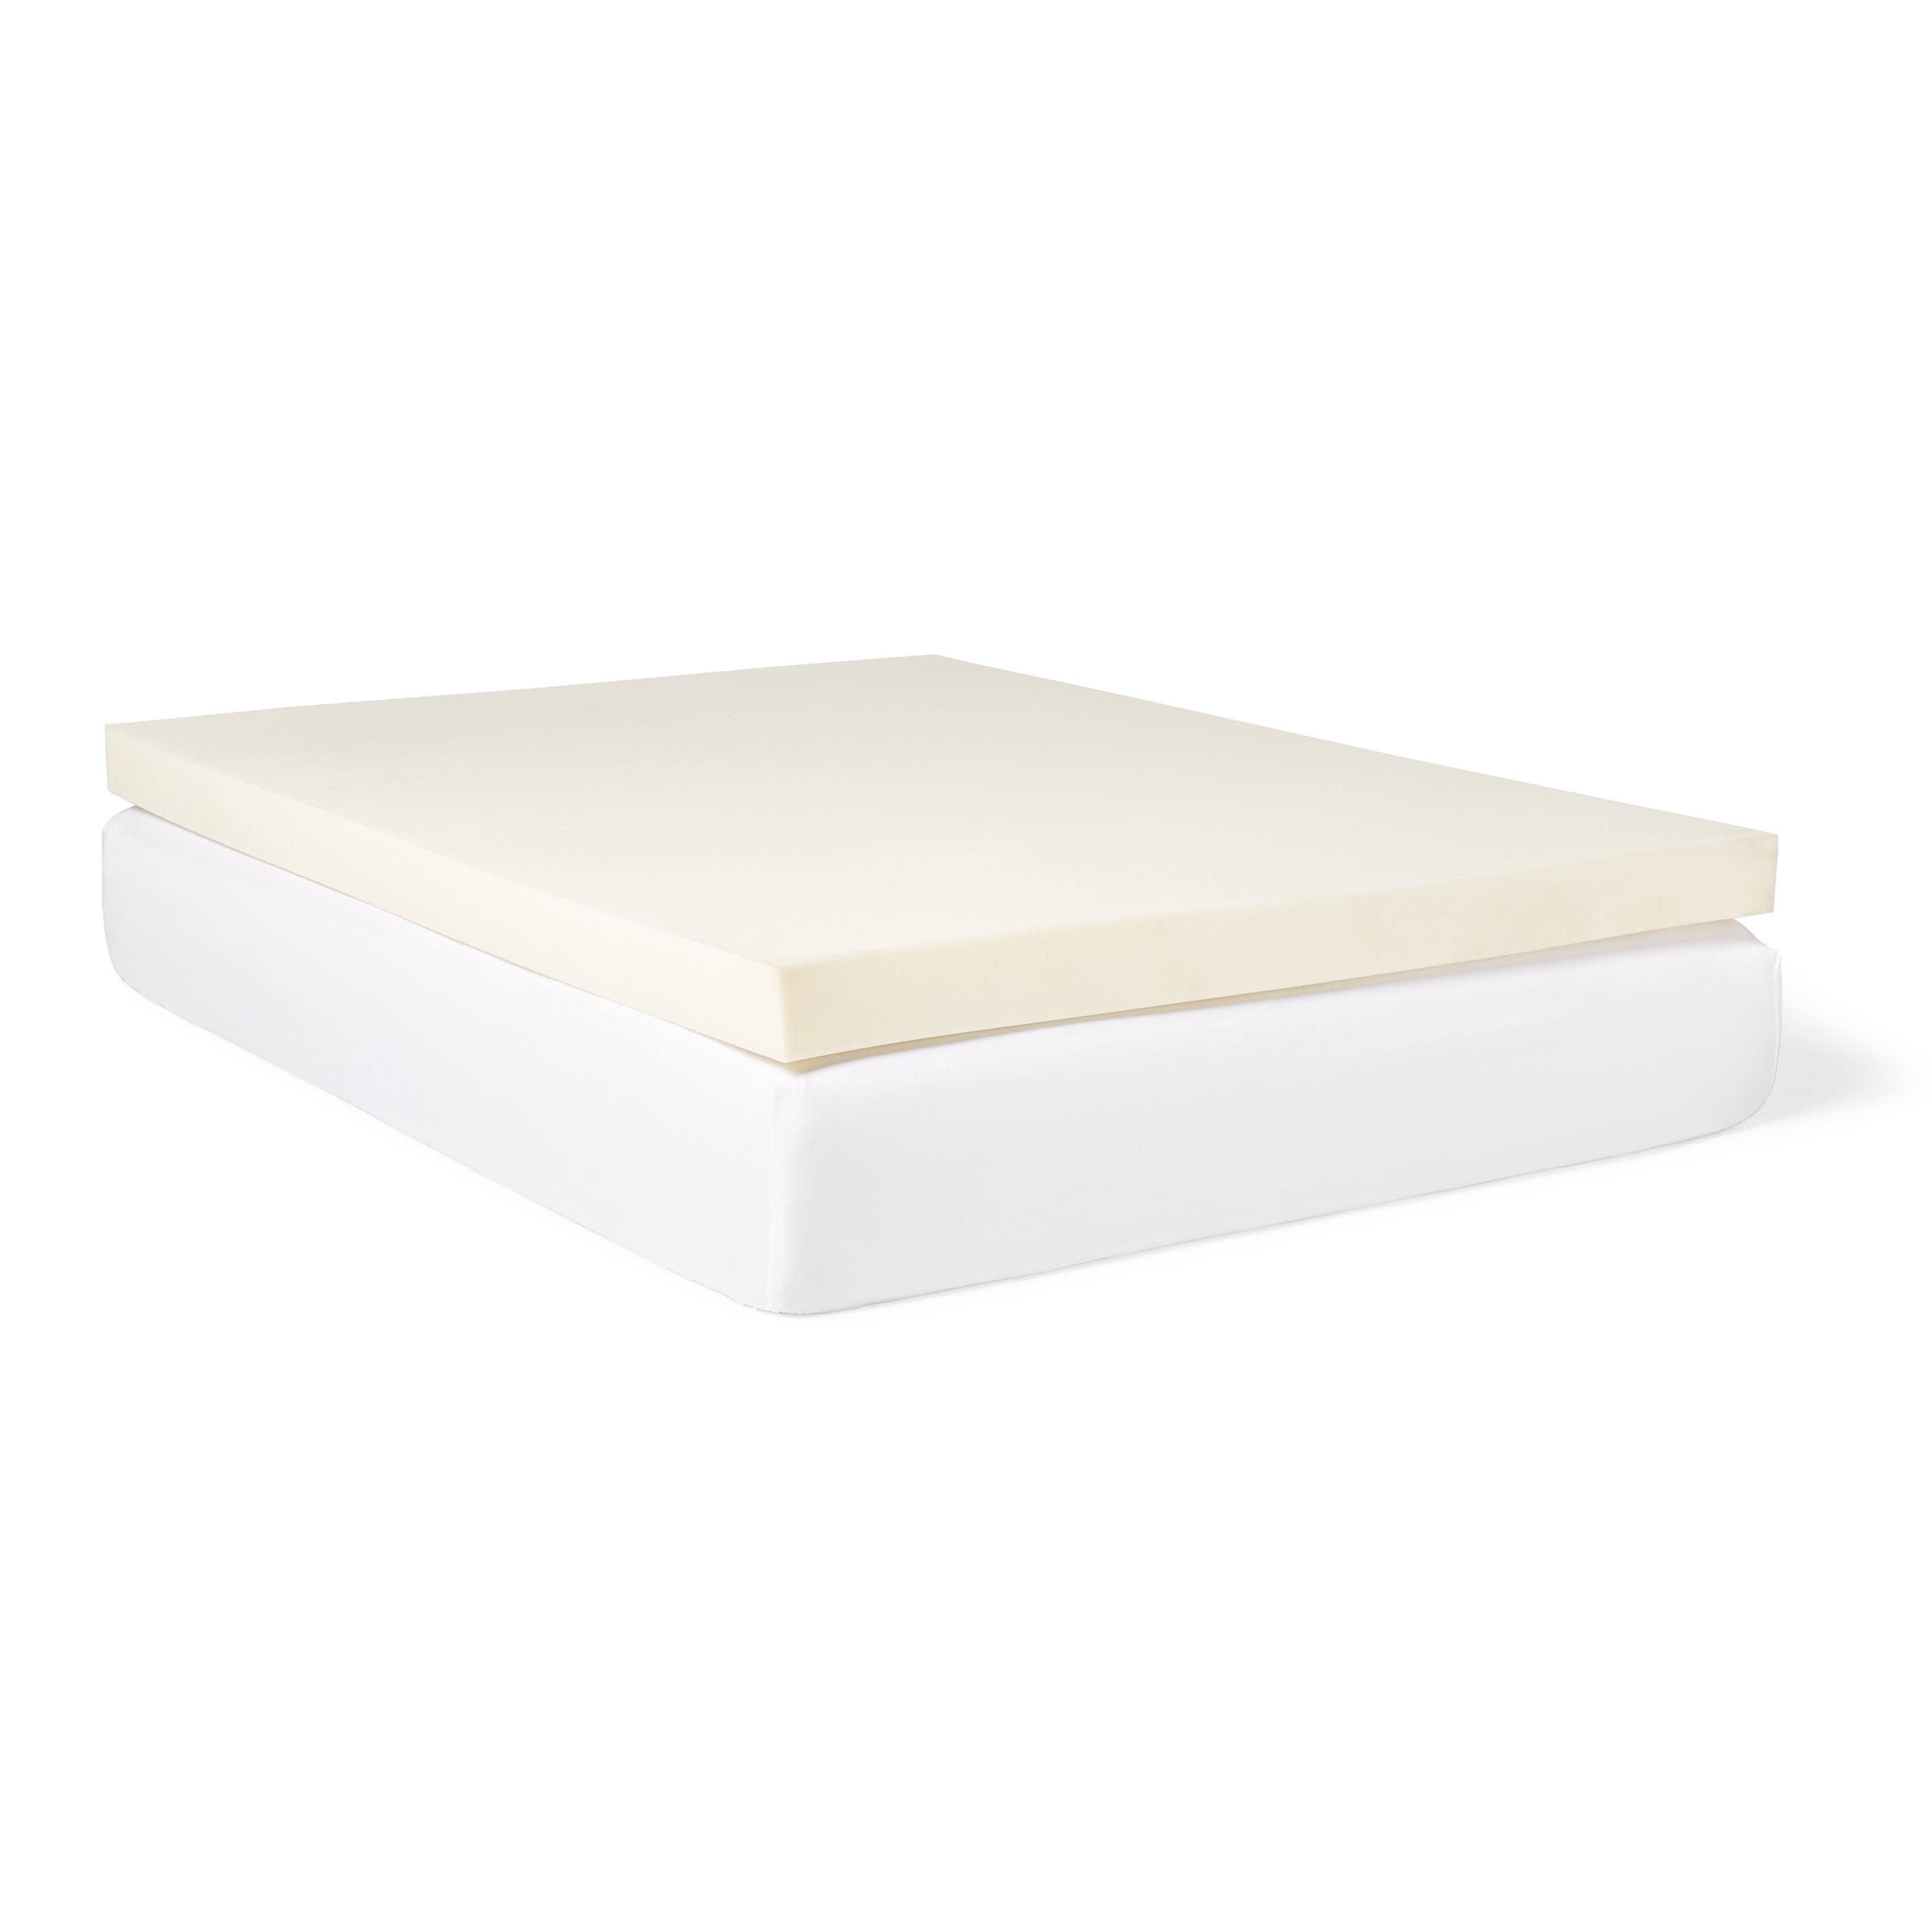 Slumber Solutions  4-inch Memory Foam Mattress Topper